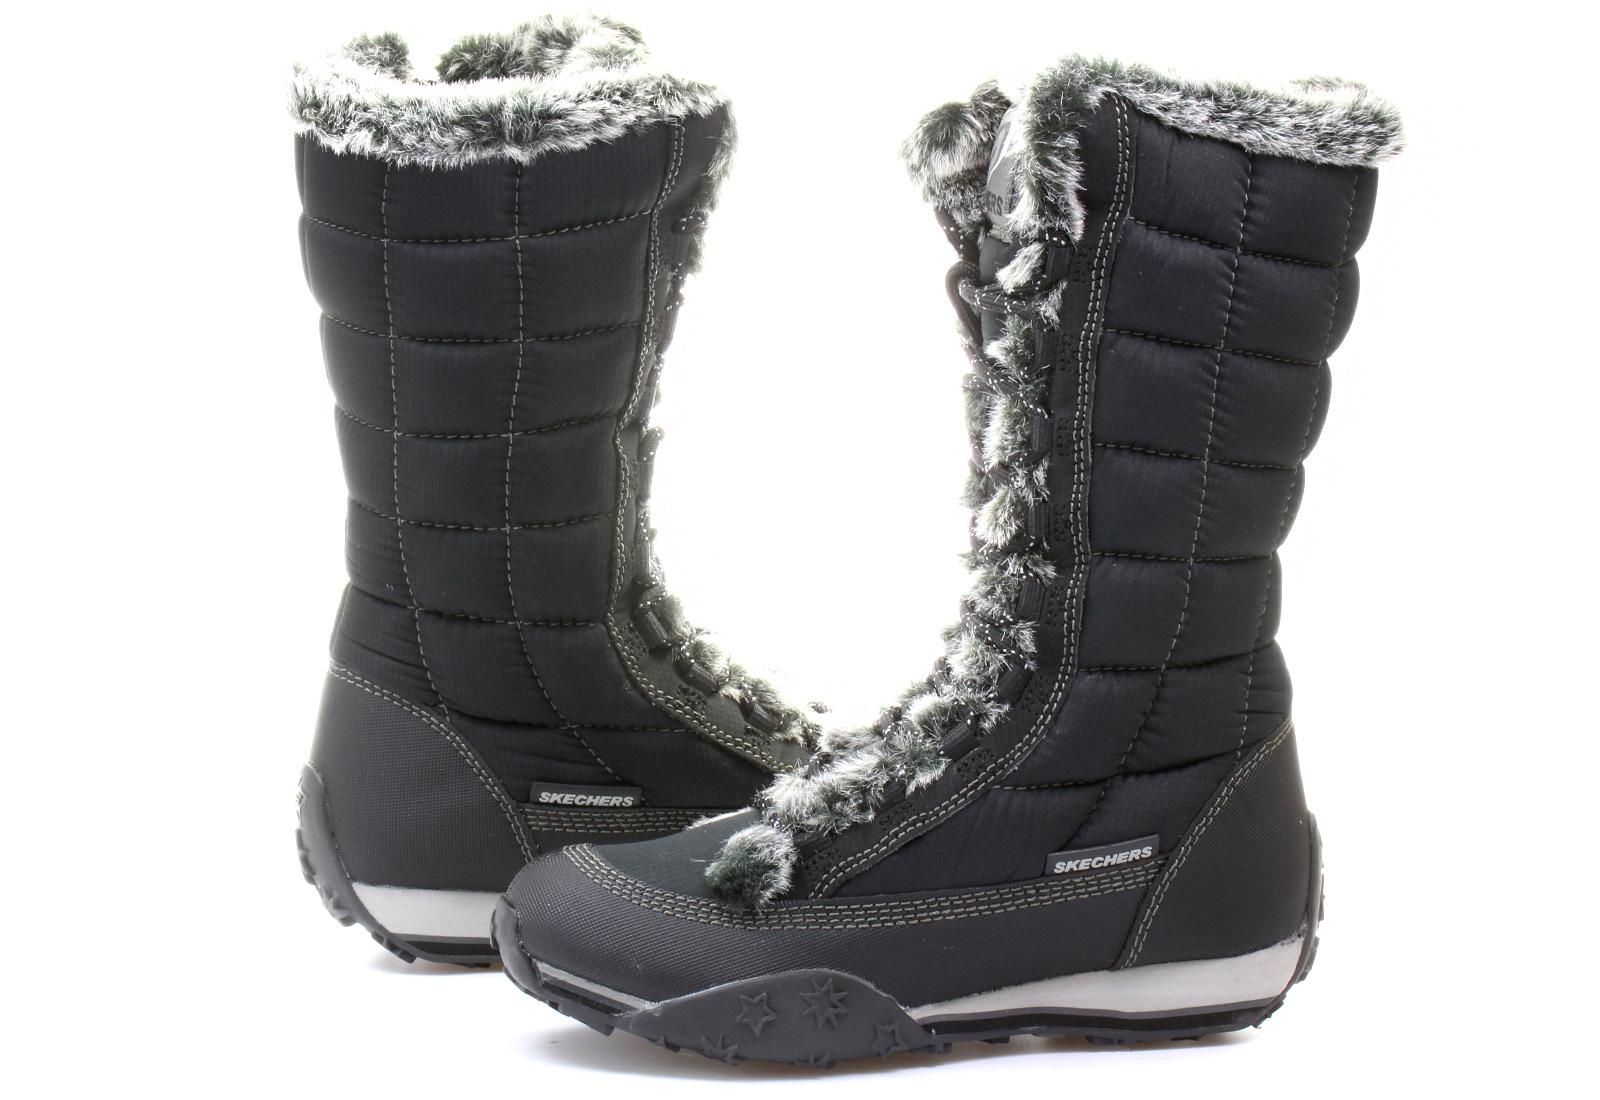 Skechers Boots - Boot High - 46476-blk - Online shop for sneakers ... 2ecd852d63